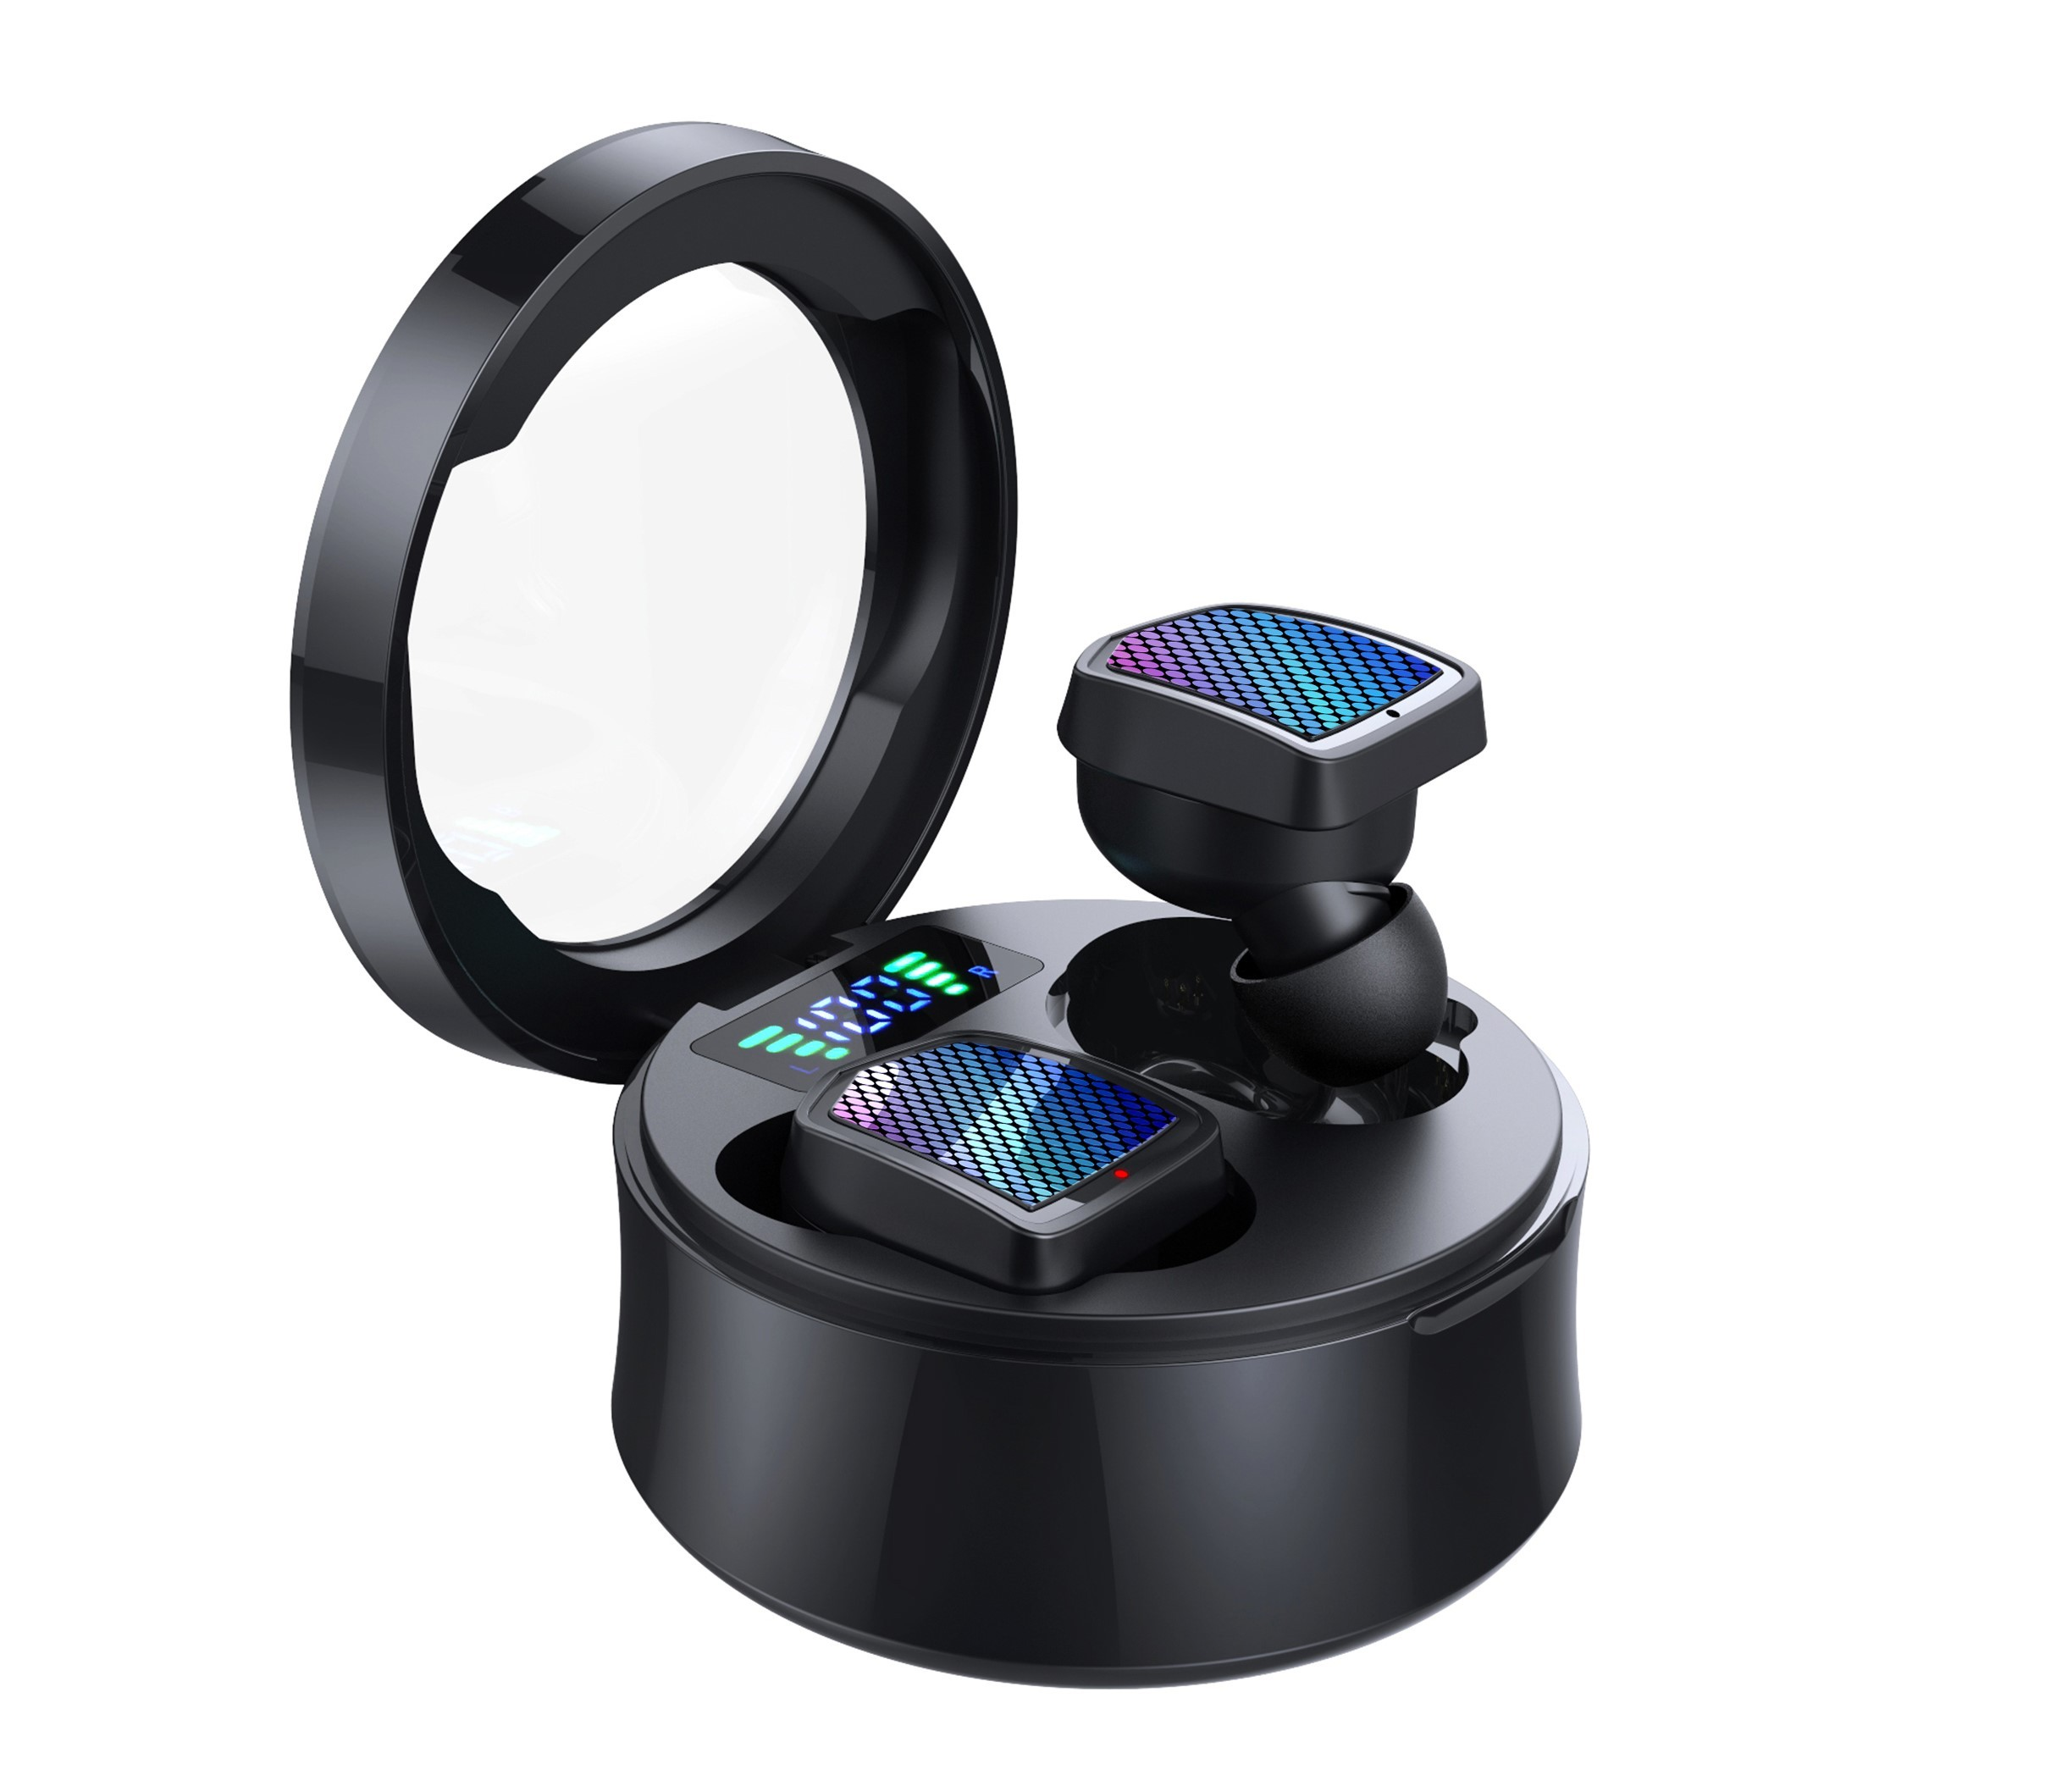 Casti Smart Techstar® TWS S30, Wireless, Bluetooth V5.0, IPX6, HD Audio, Touch, iOS, Android, Type-C, Negru imagine techstar.ro 2021